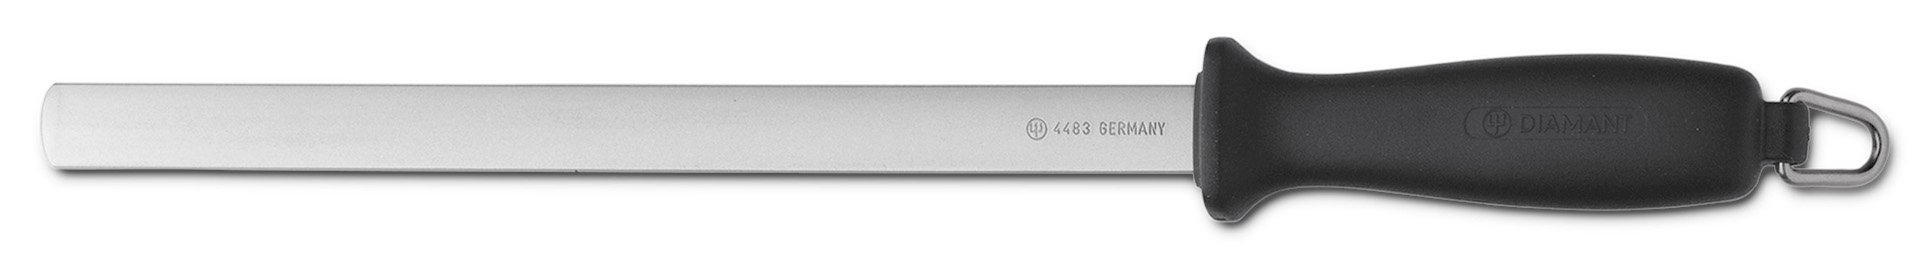 Wusthof 4483 10-Inch Diamond Sharpening Steel, Wide